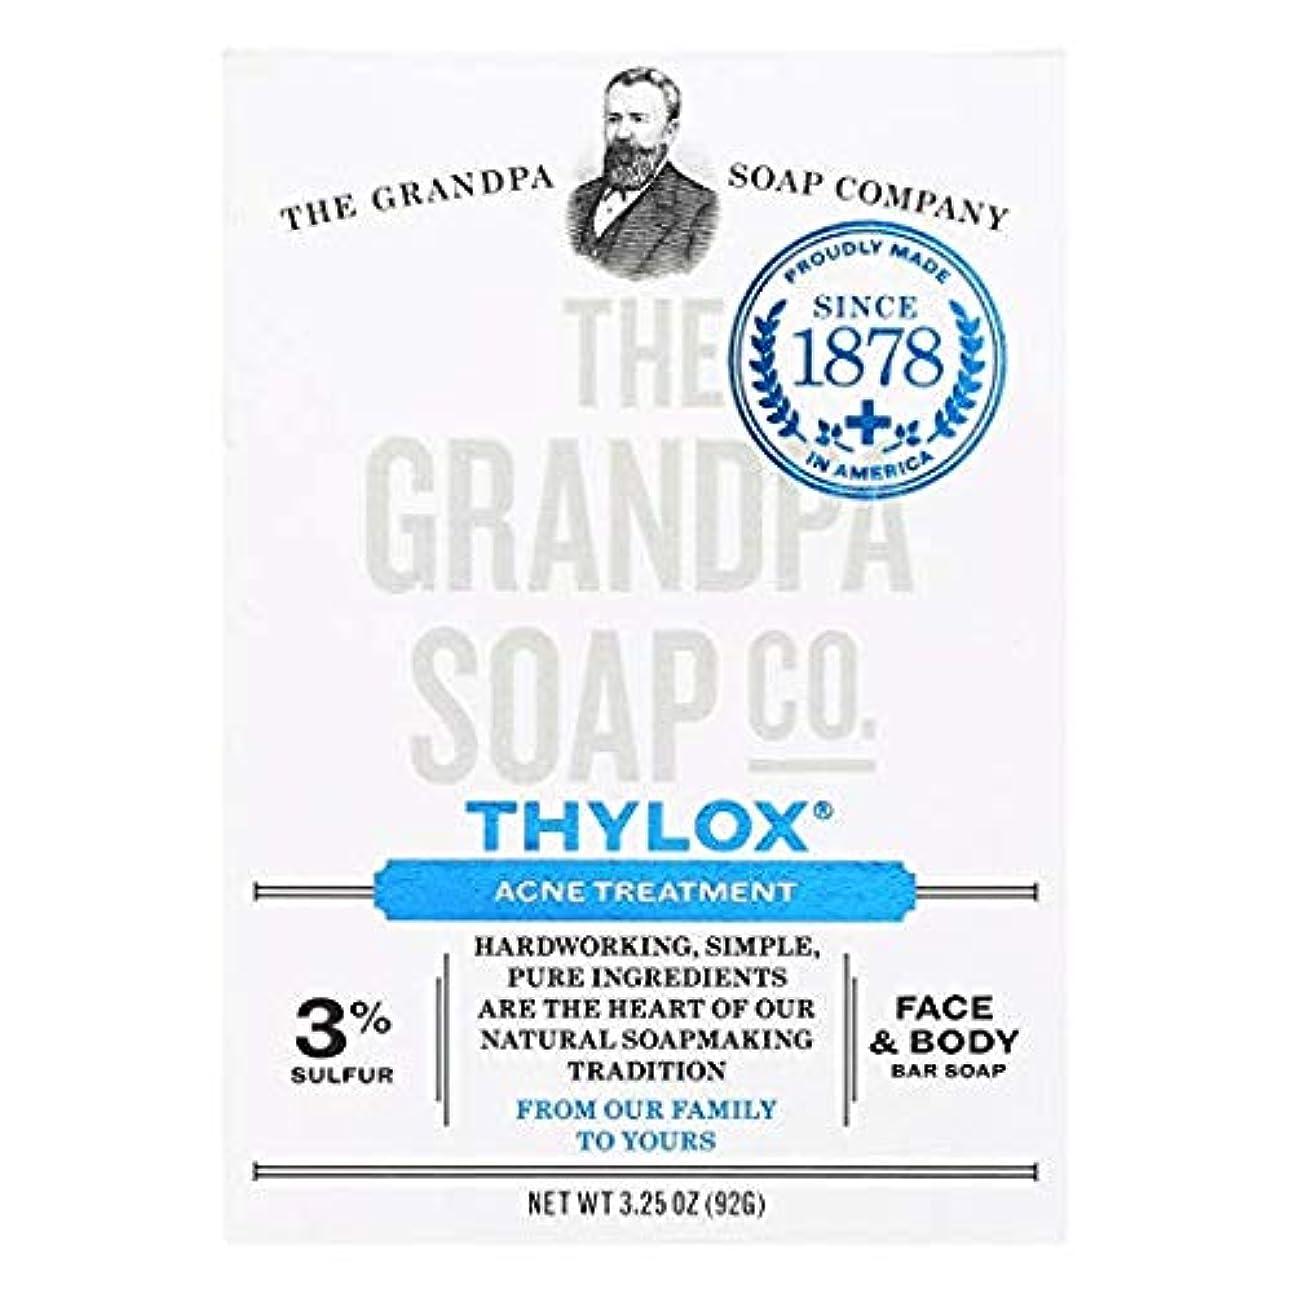 シャープ陸軍長椅子海外直送品 Grandpa's Brands Company Thylox Acne Treatment Soap, 3.25 oz Each